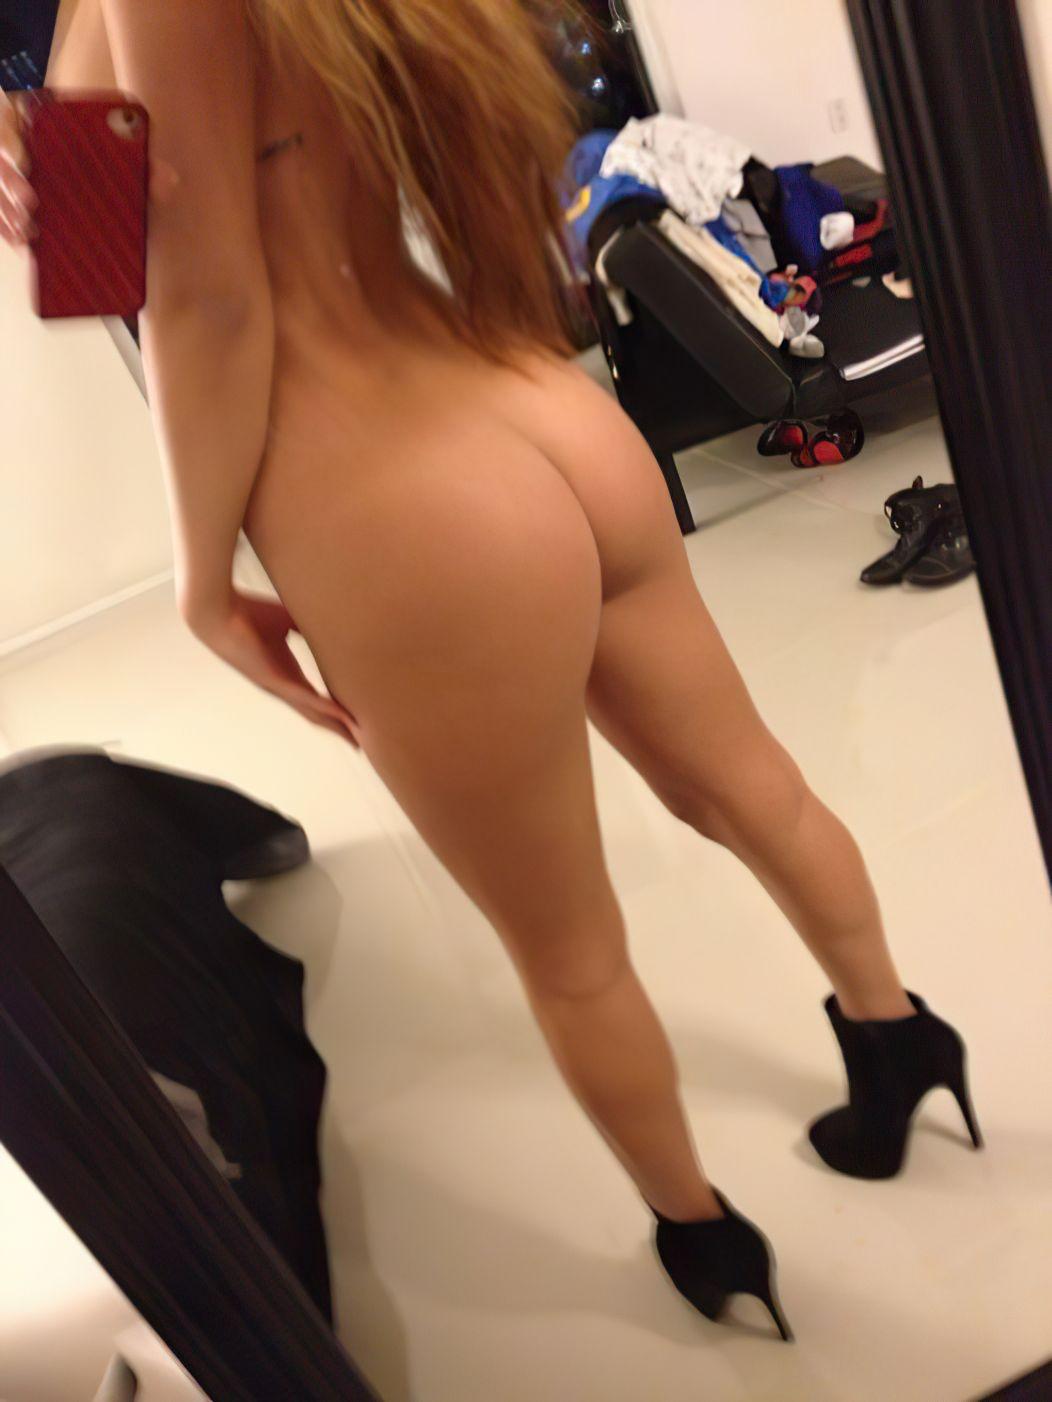 Chantel Jeffries Nude Leaked fappenings.com 5